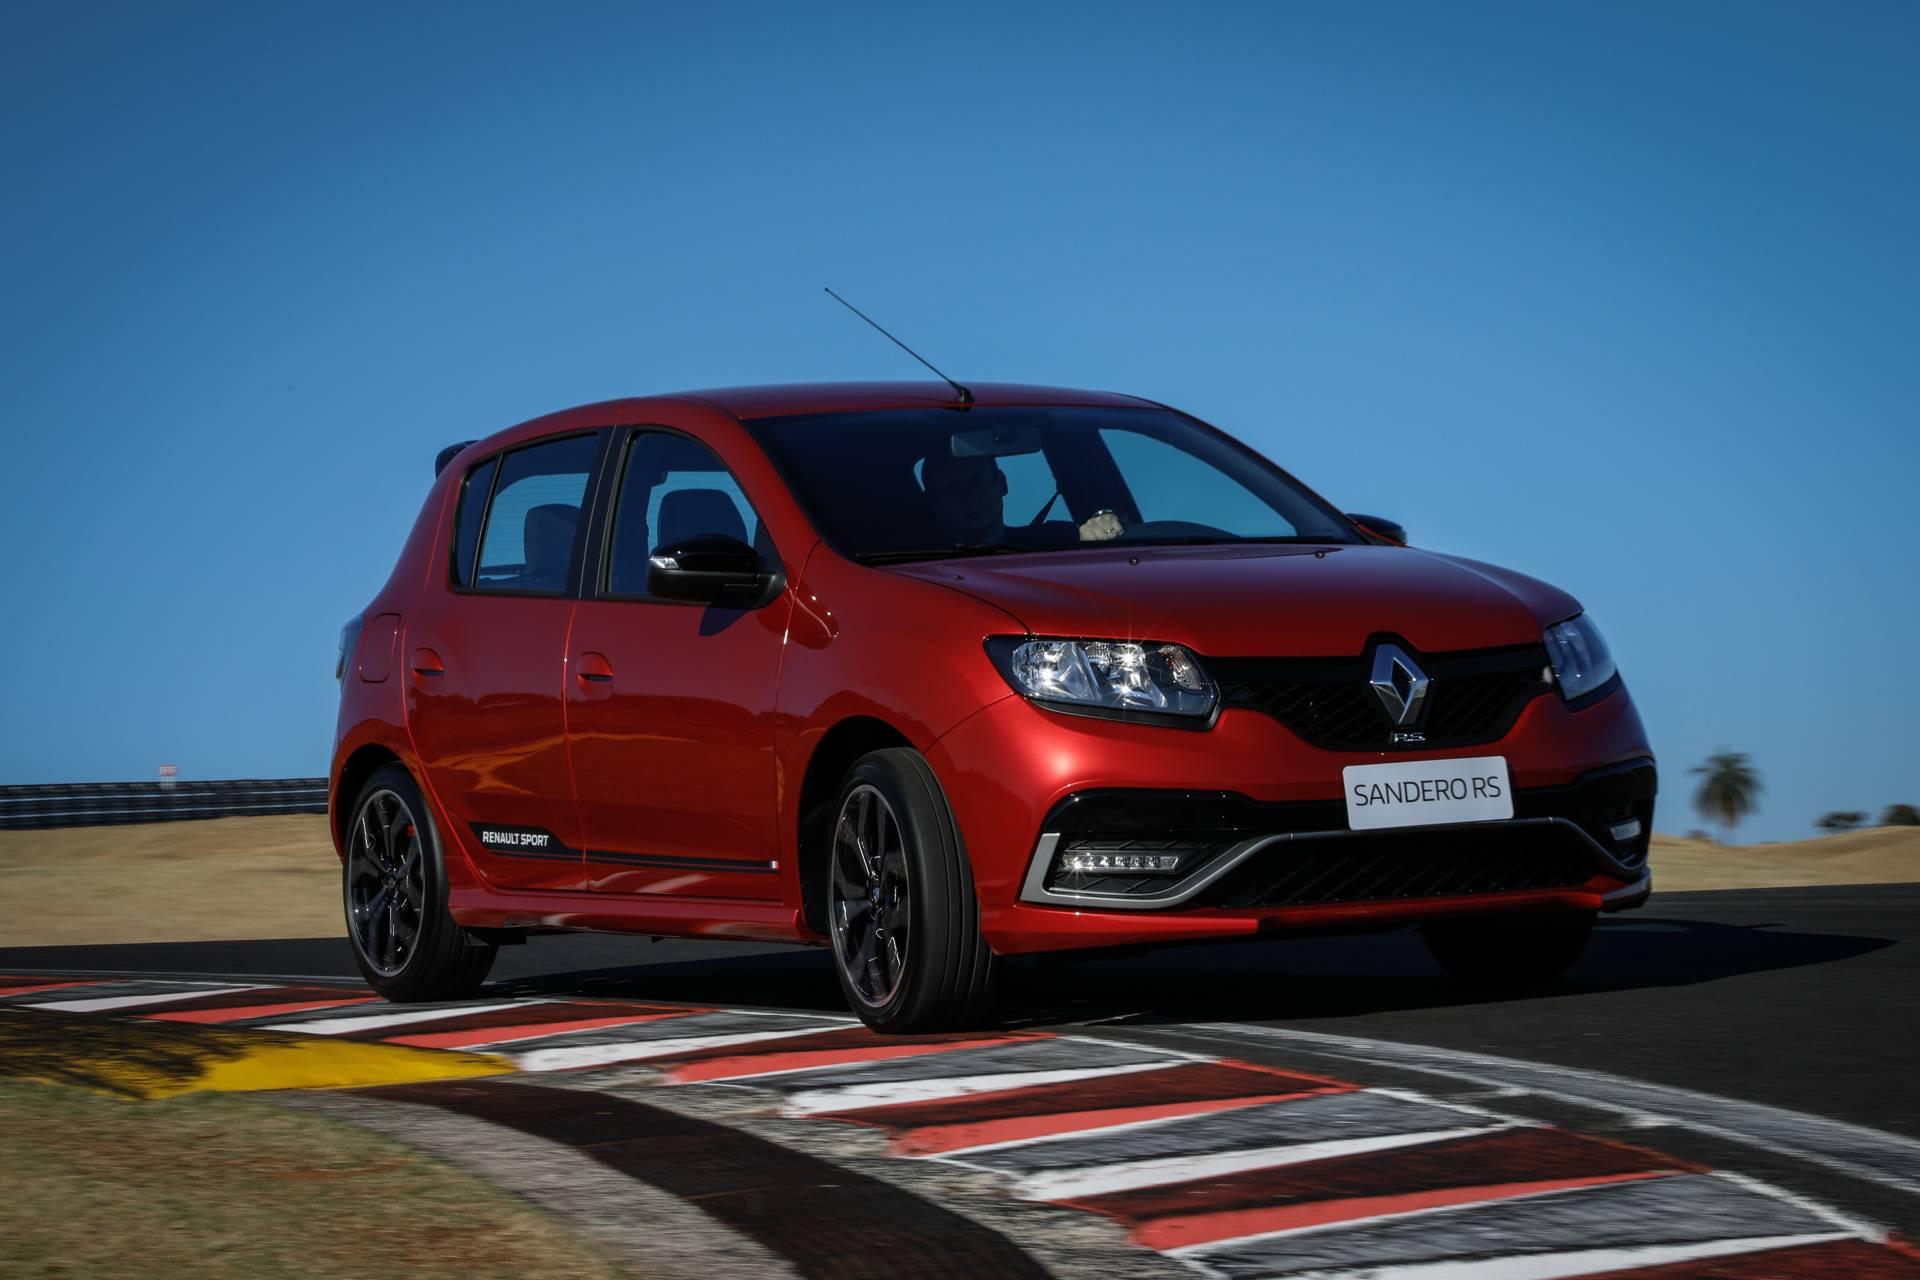 2020_Renault_Sandero_RS_facelift_0011